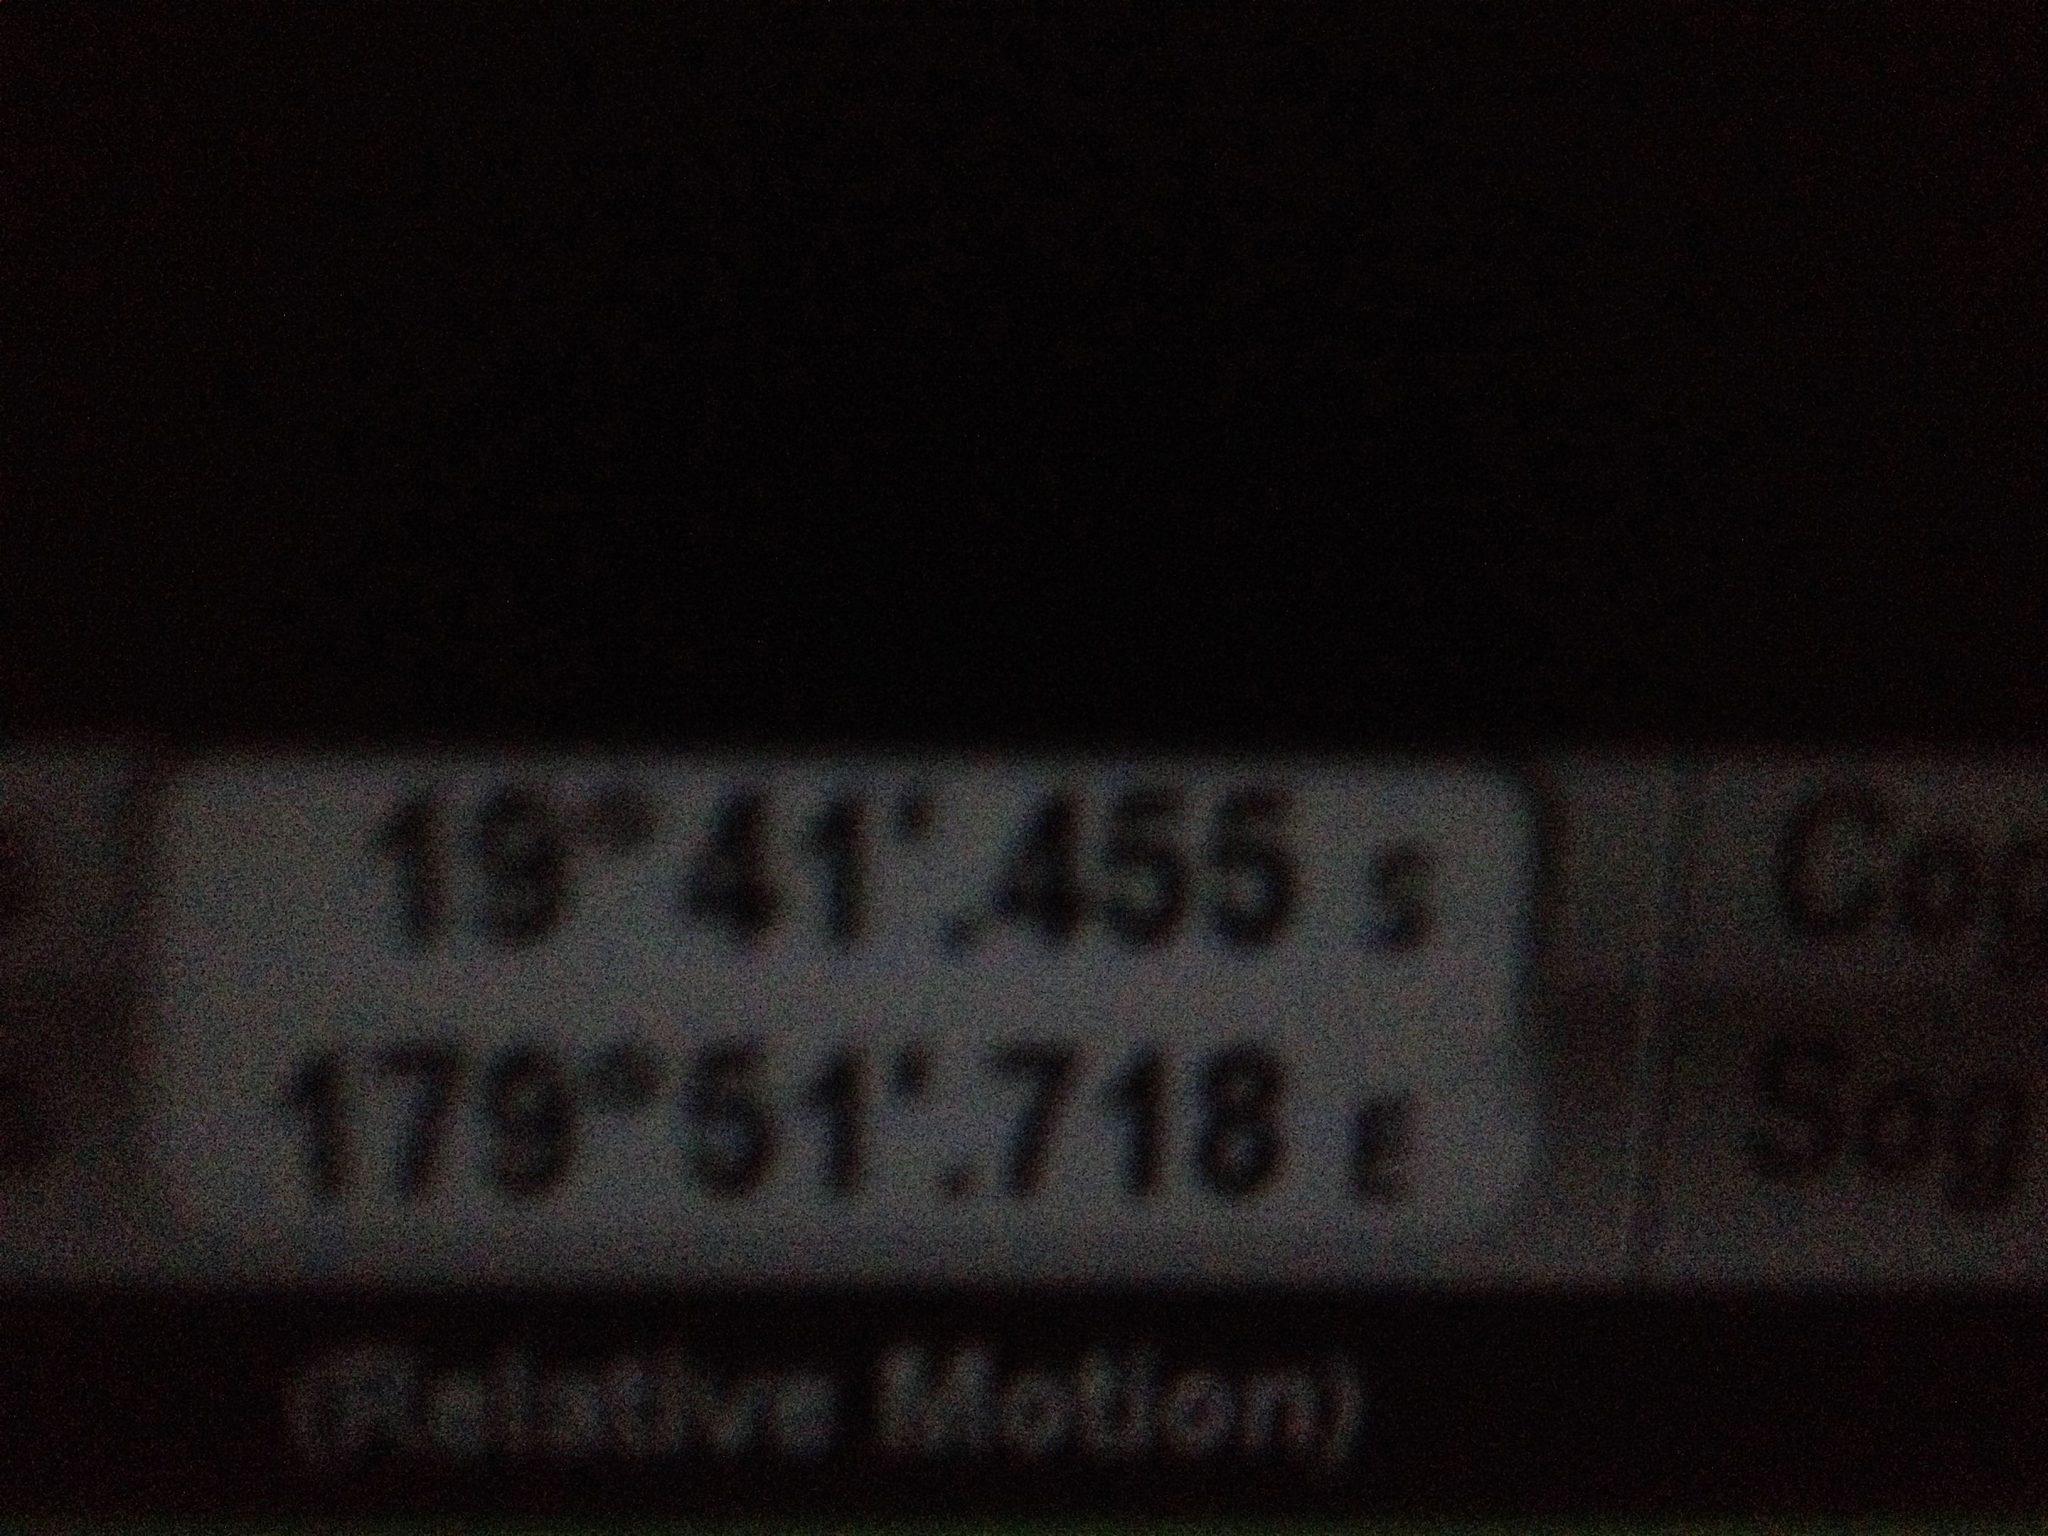 38. On this passage from Tonga to Vanuatu, Joyful crossed the 180th meridian, the International Date Line!!!